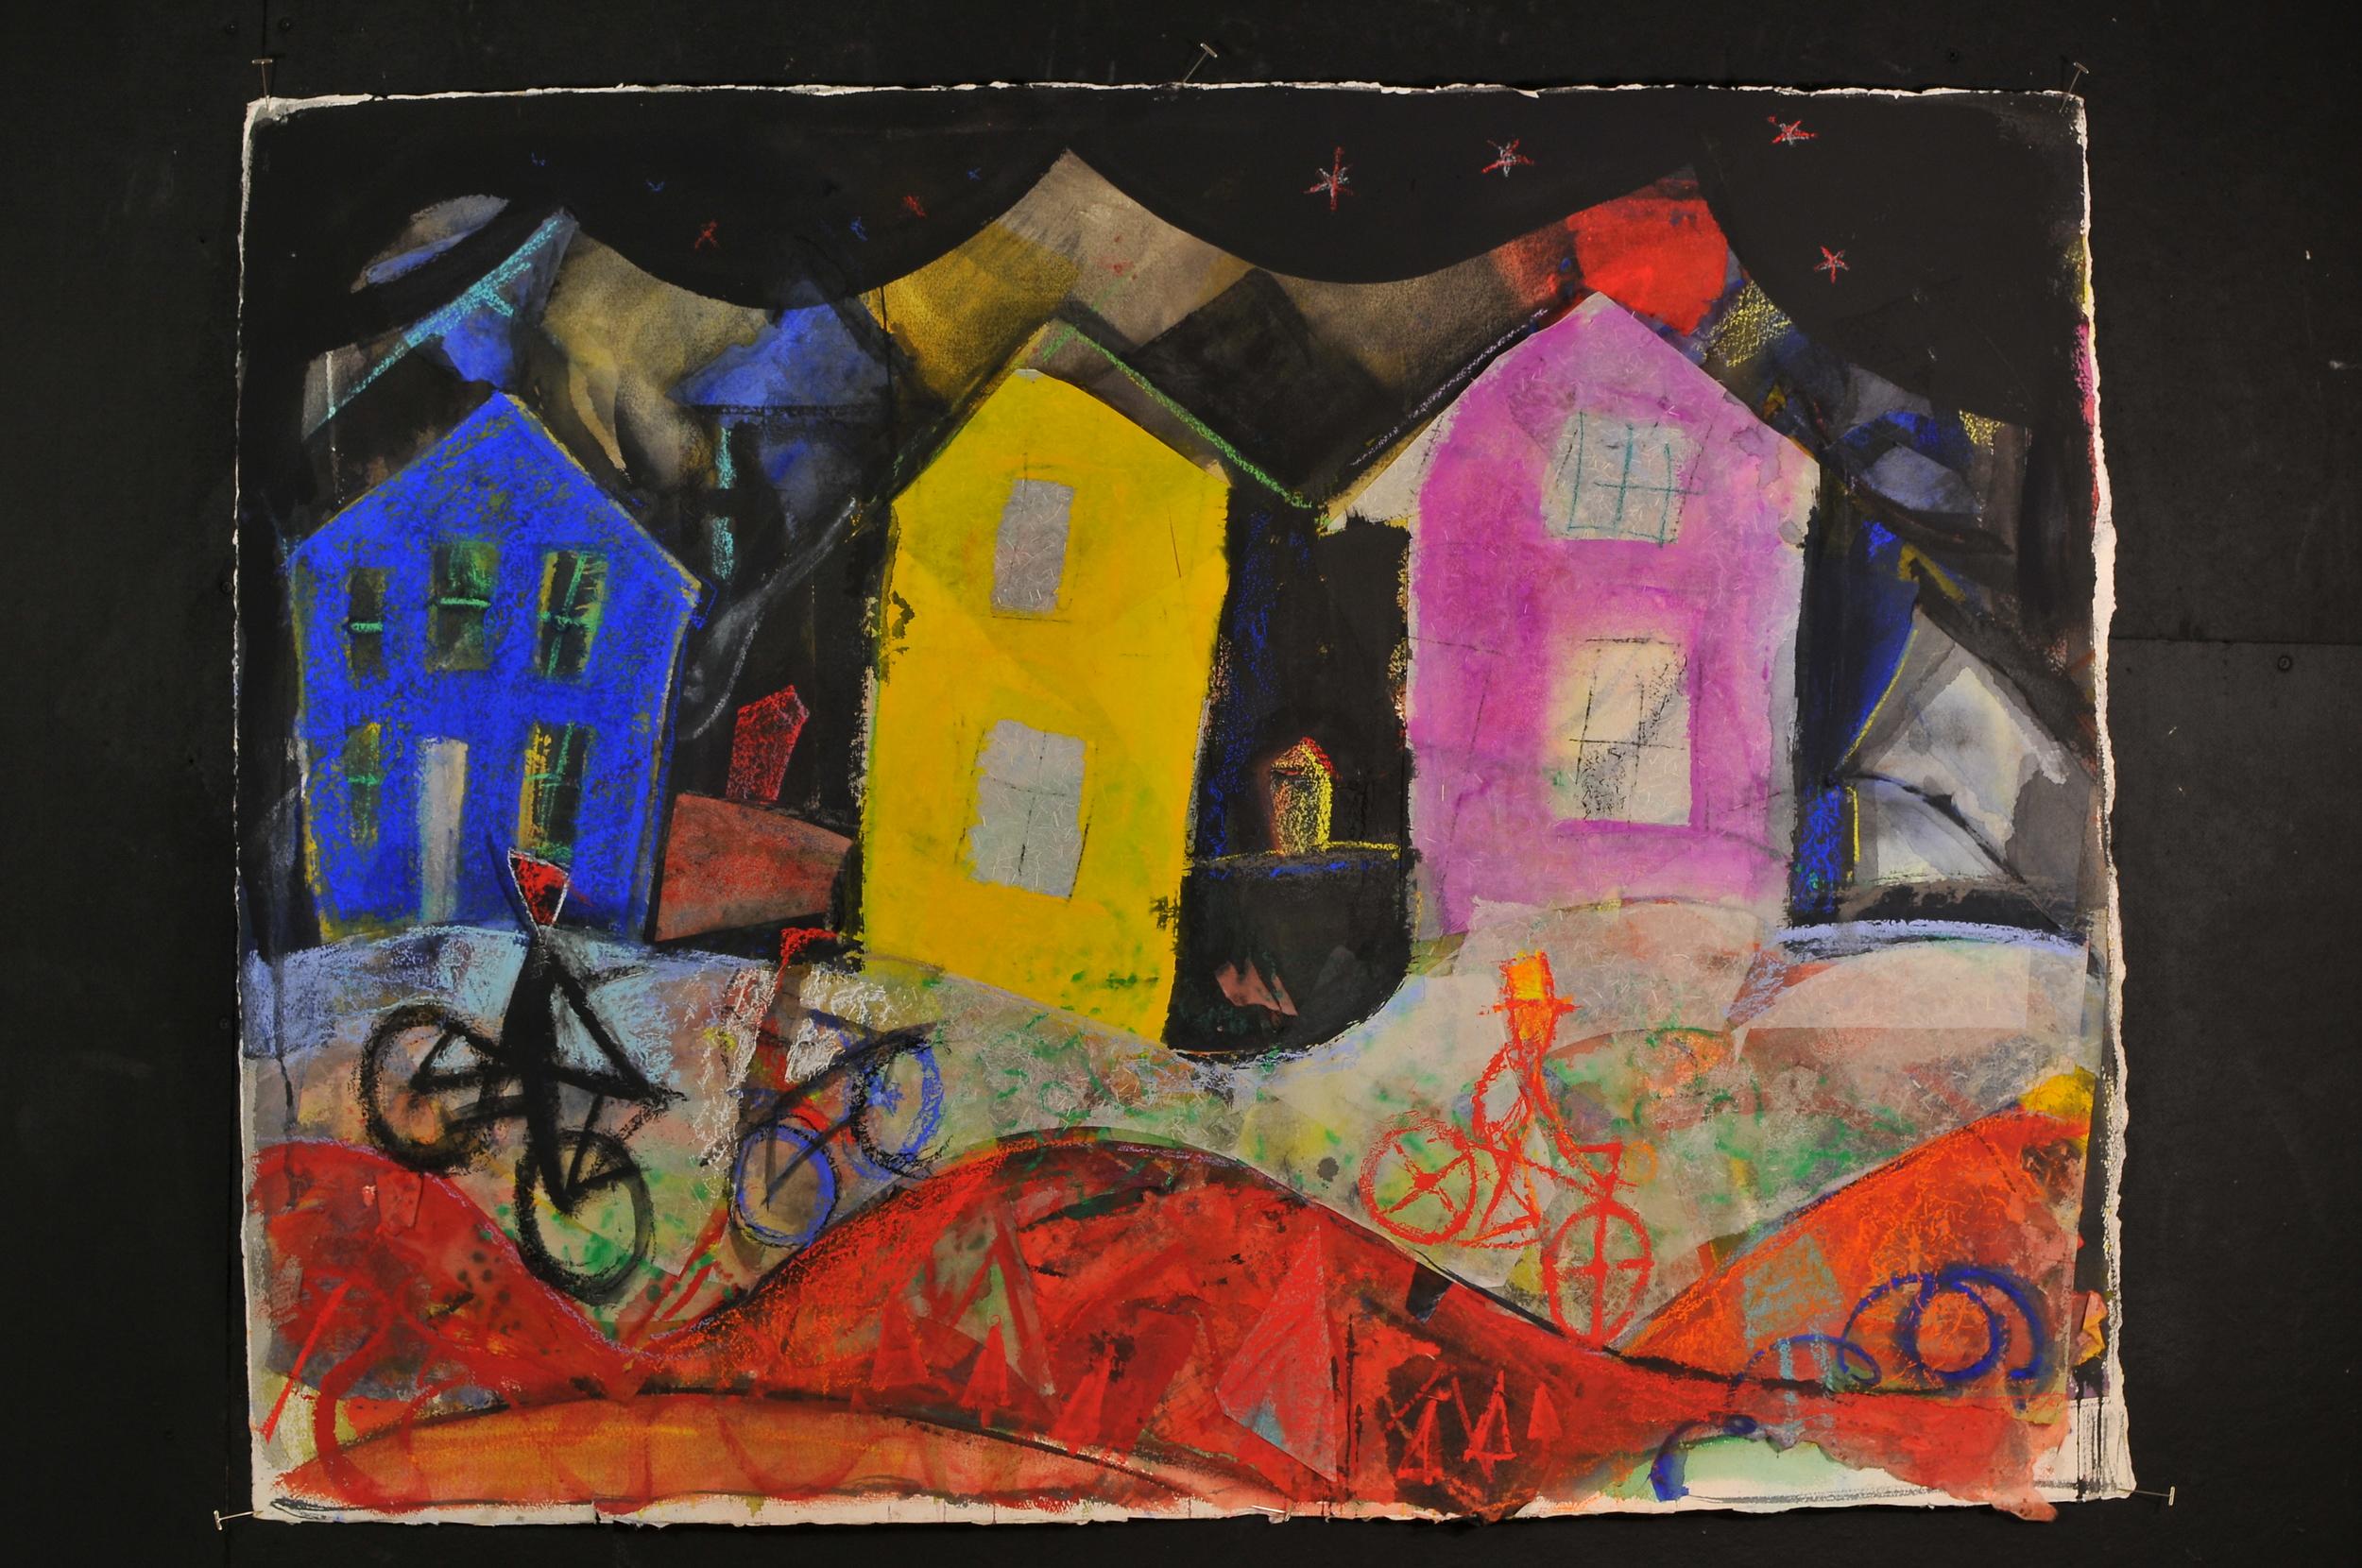 "Houses at Night -  2009-Mixed media -40 x 52"" image size"